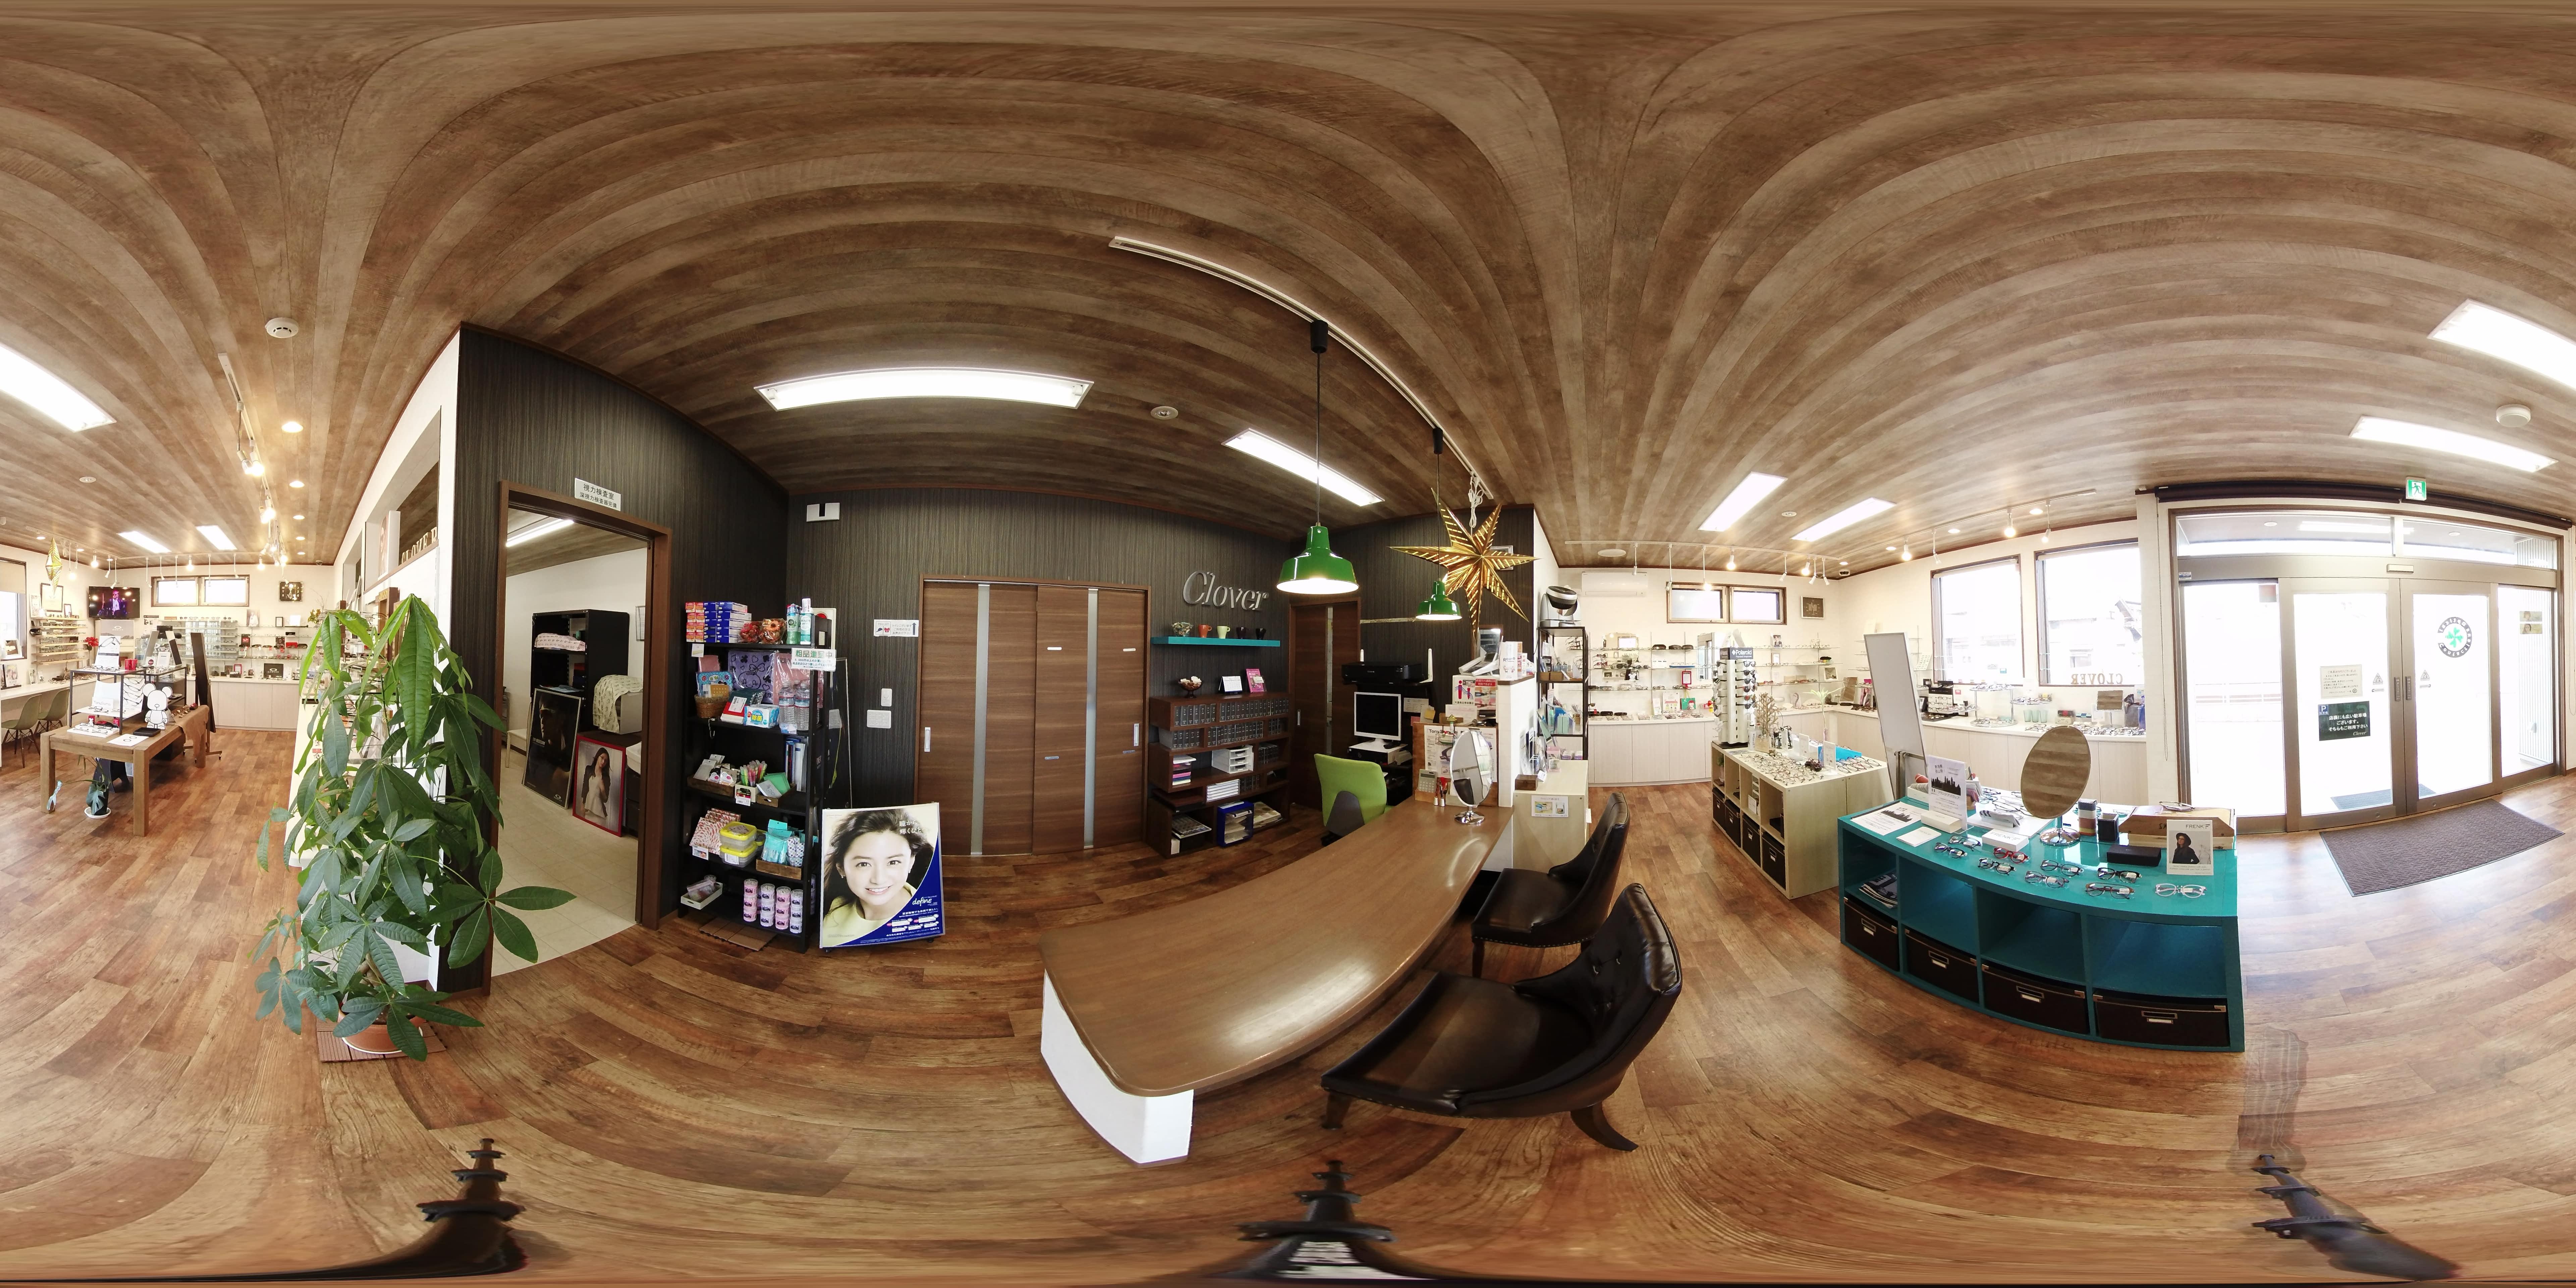 Googleストリートビューの店内撮影